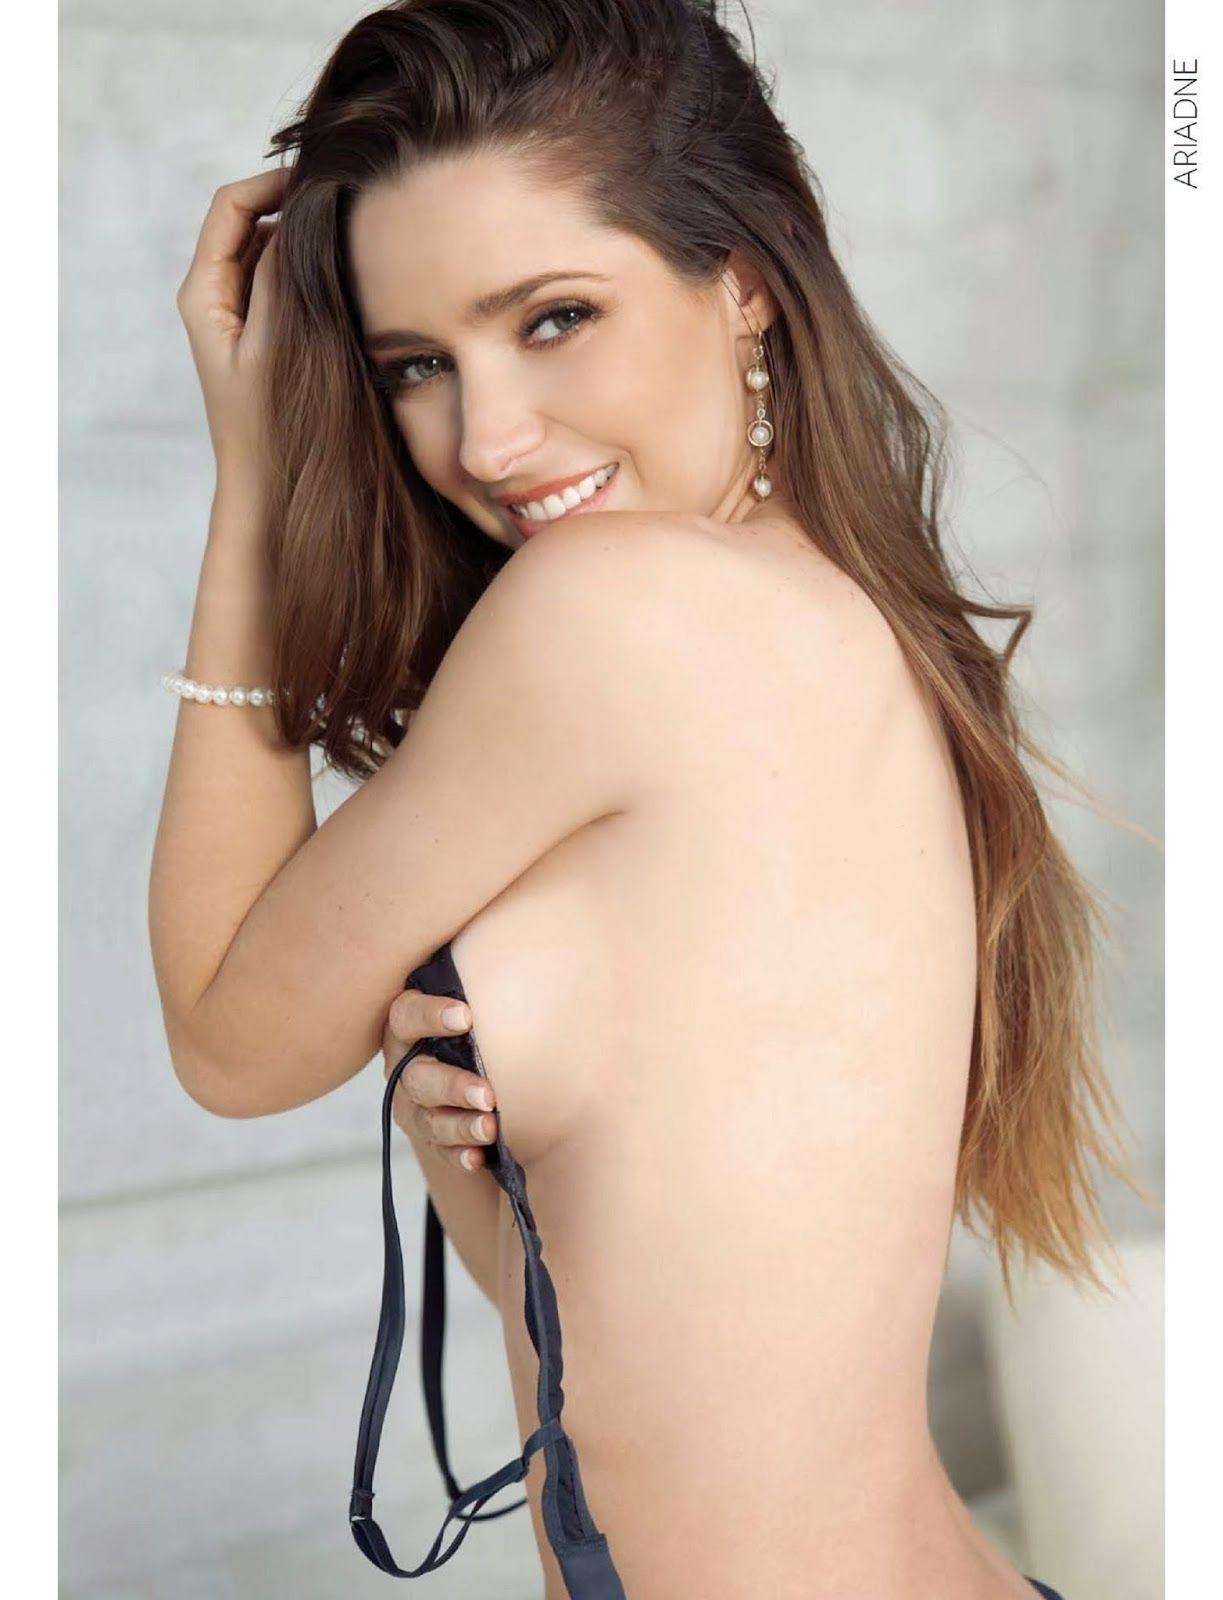 ariadne-diaz-desnuda-en-pornography-mature-fat-pussy-movies